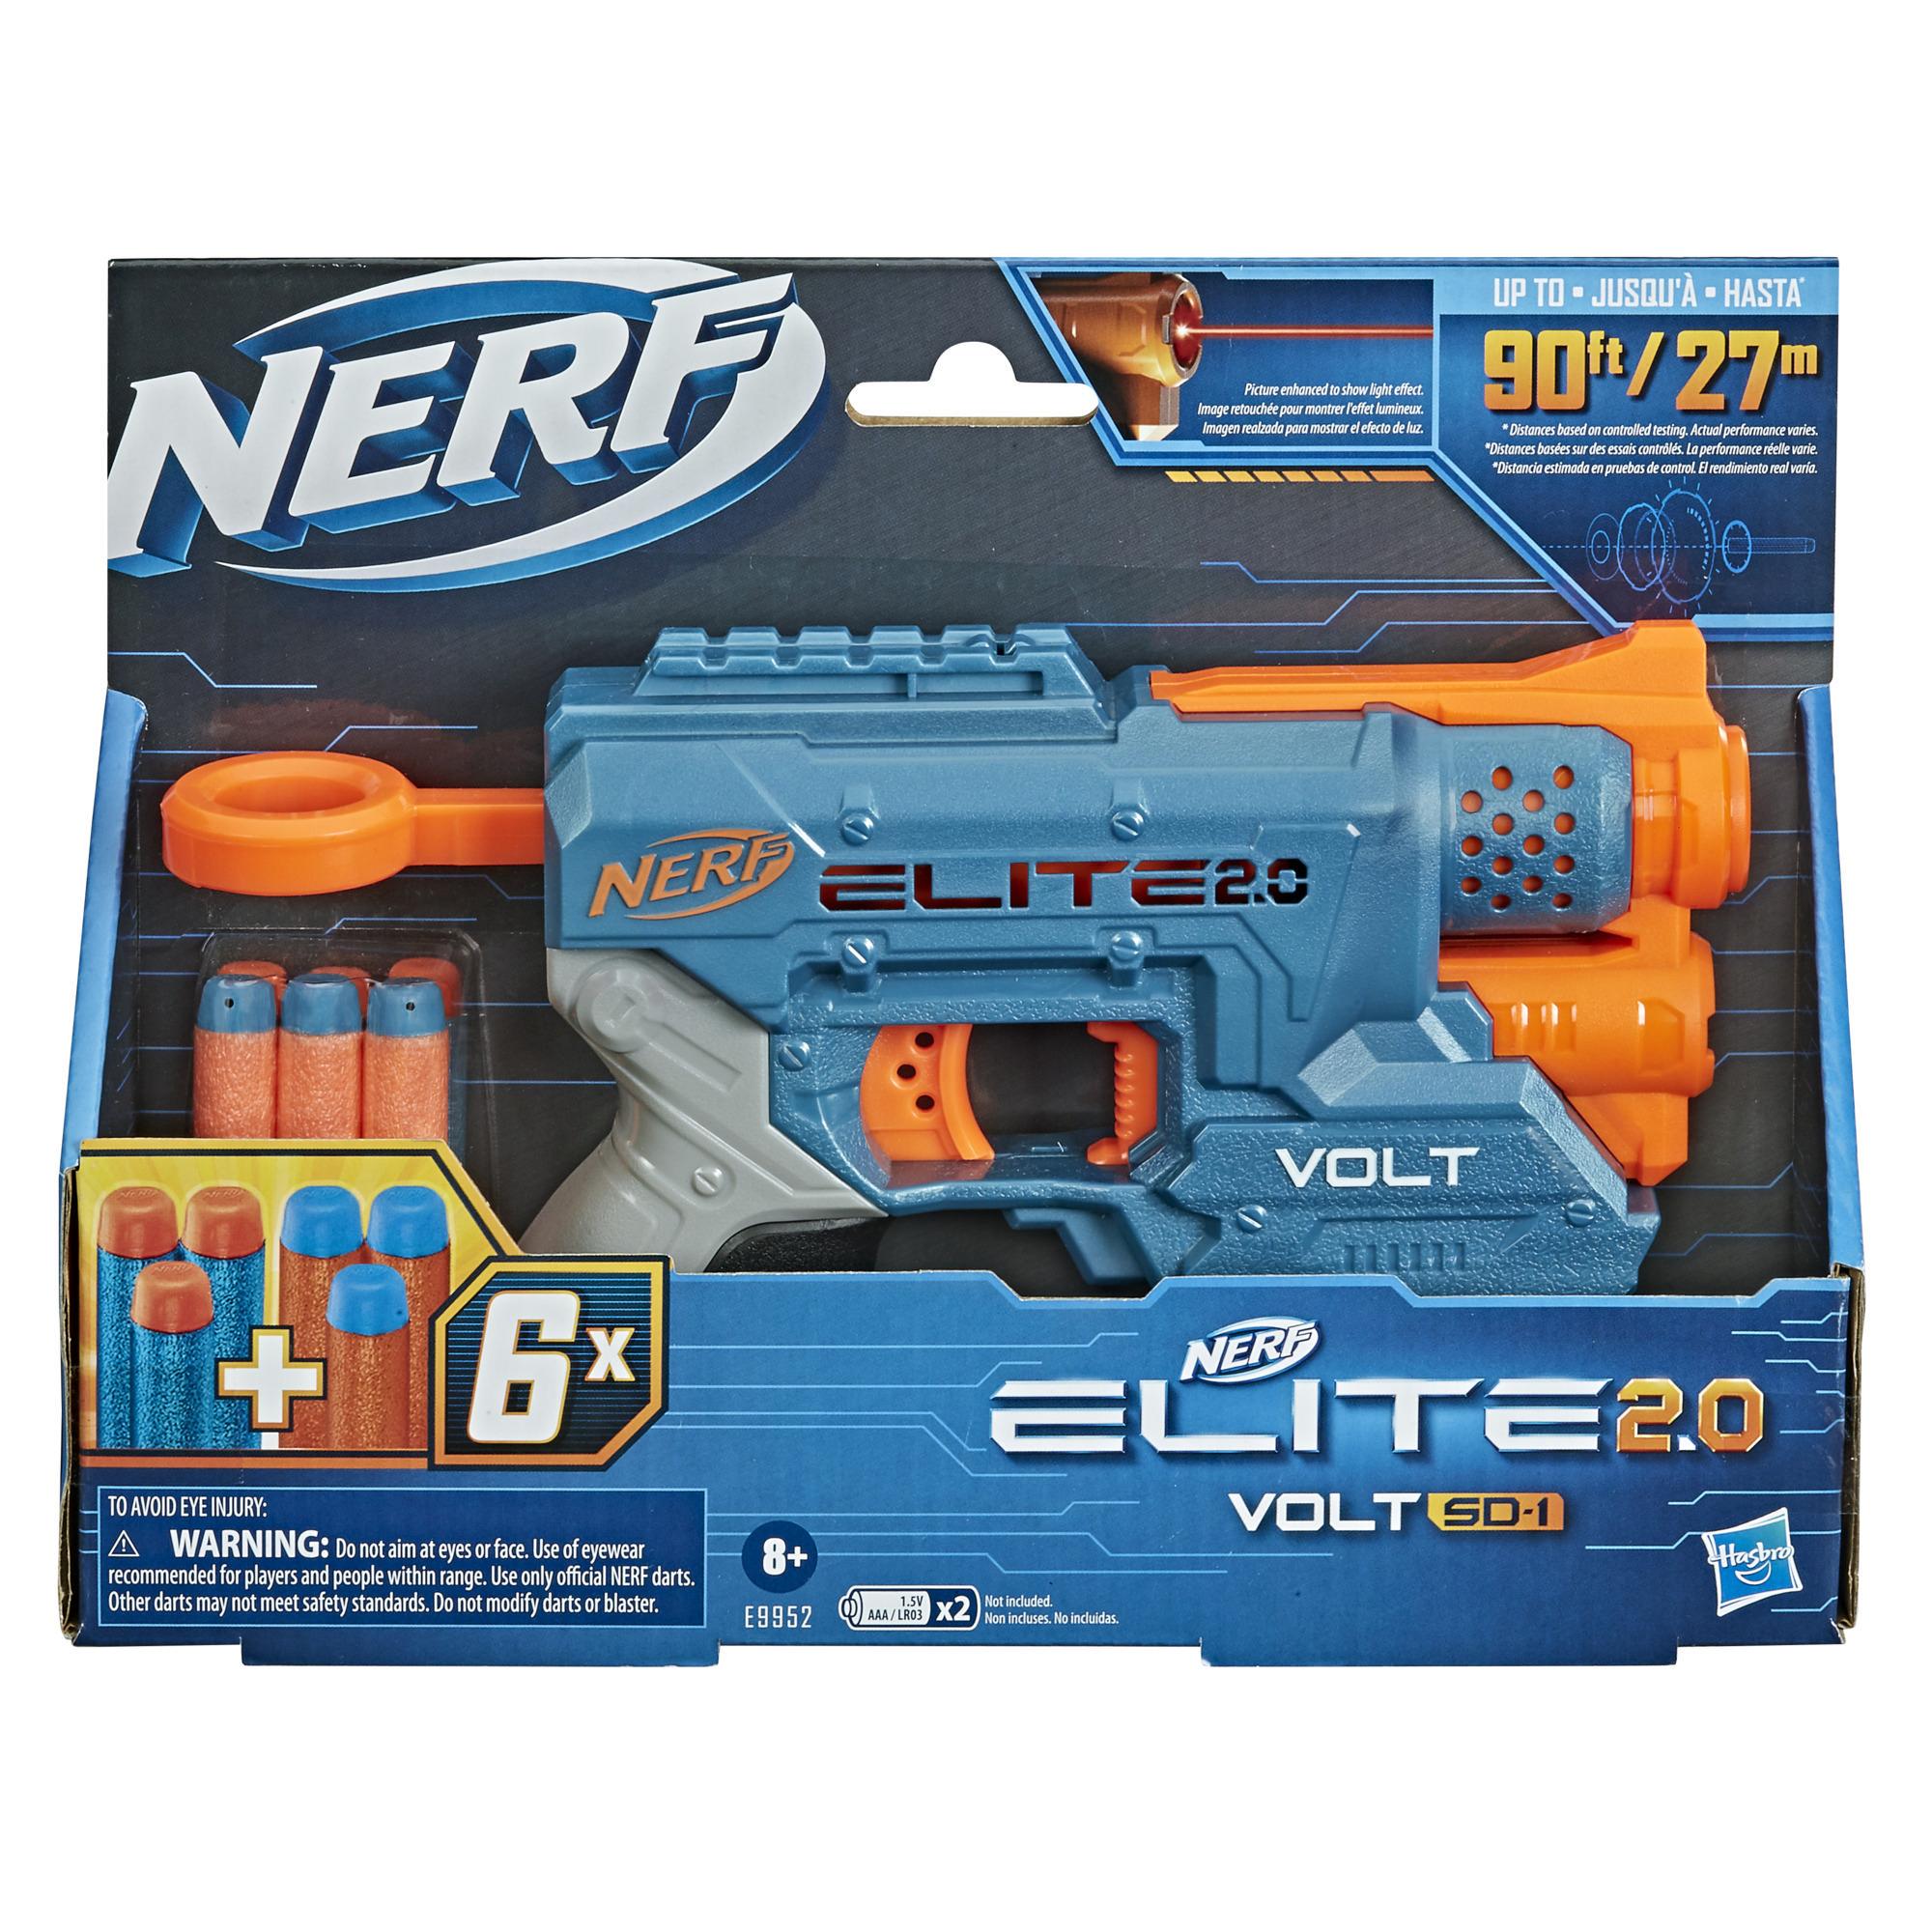 Blaster Nerf Elite 2.0 Volt SD-1 – 6 sageti Nerf oficiale, Sistem de tintire cu raza luminoasa, capacitate de depozitare pentru 2 sageti, 2 sine tactice